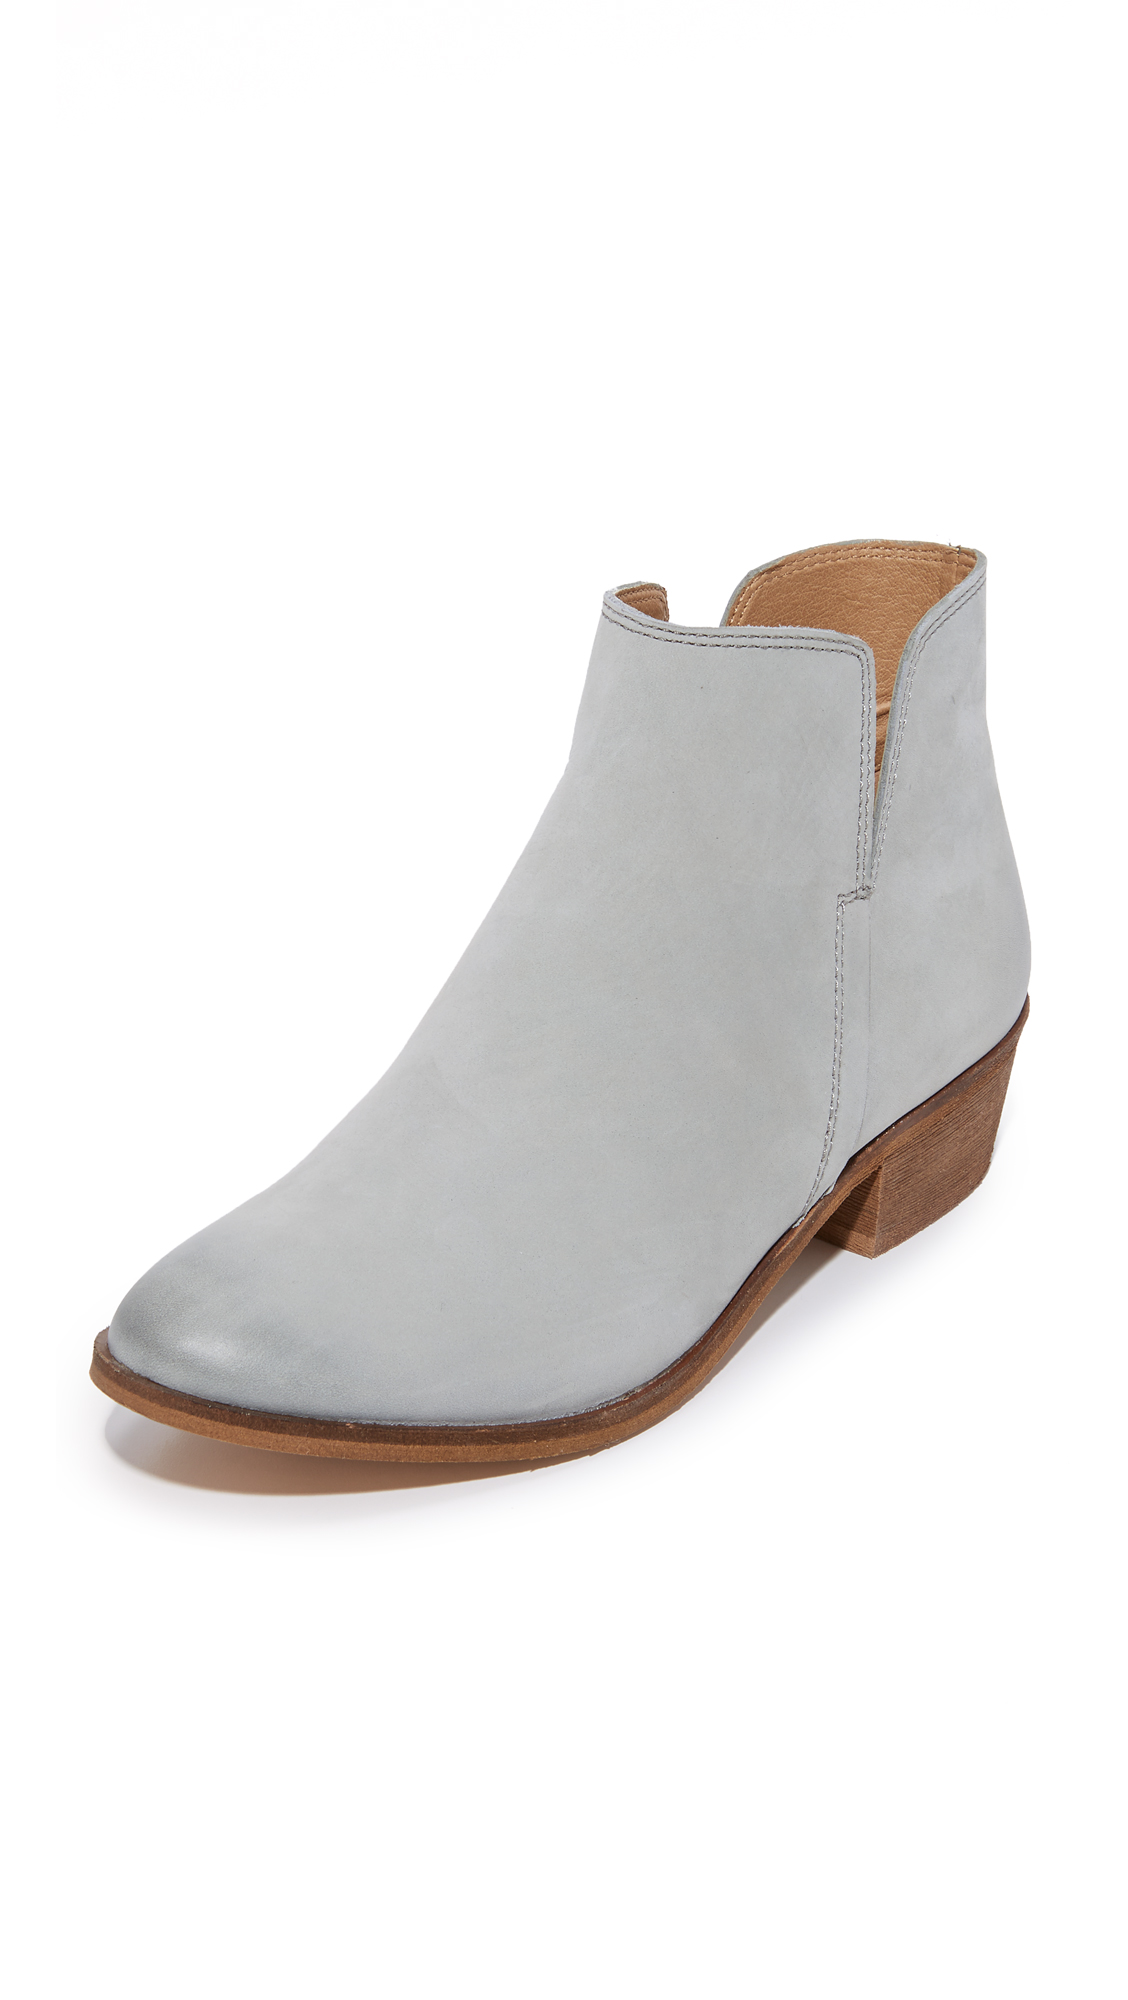 Splendid Hamptyn Booties - Gray